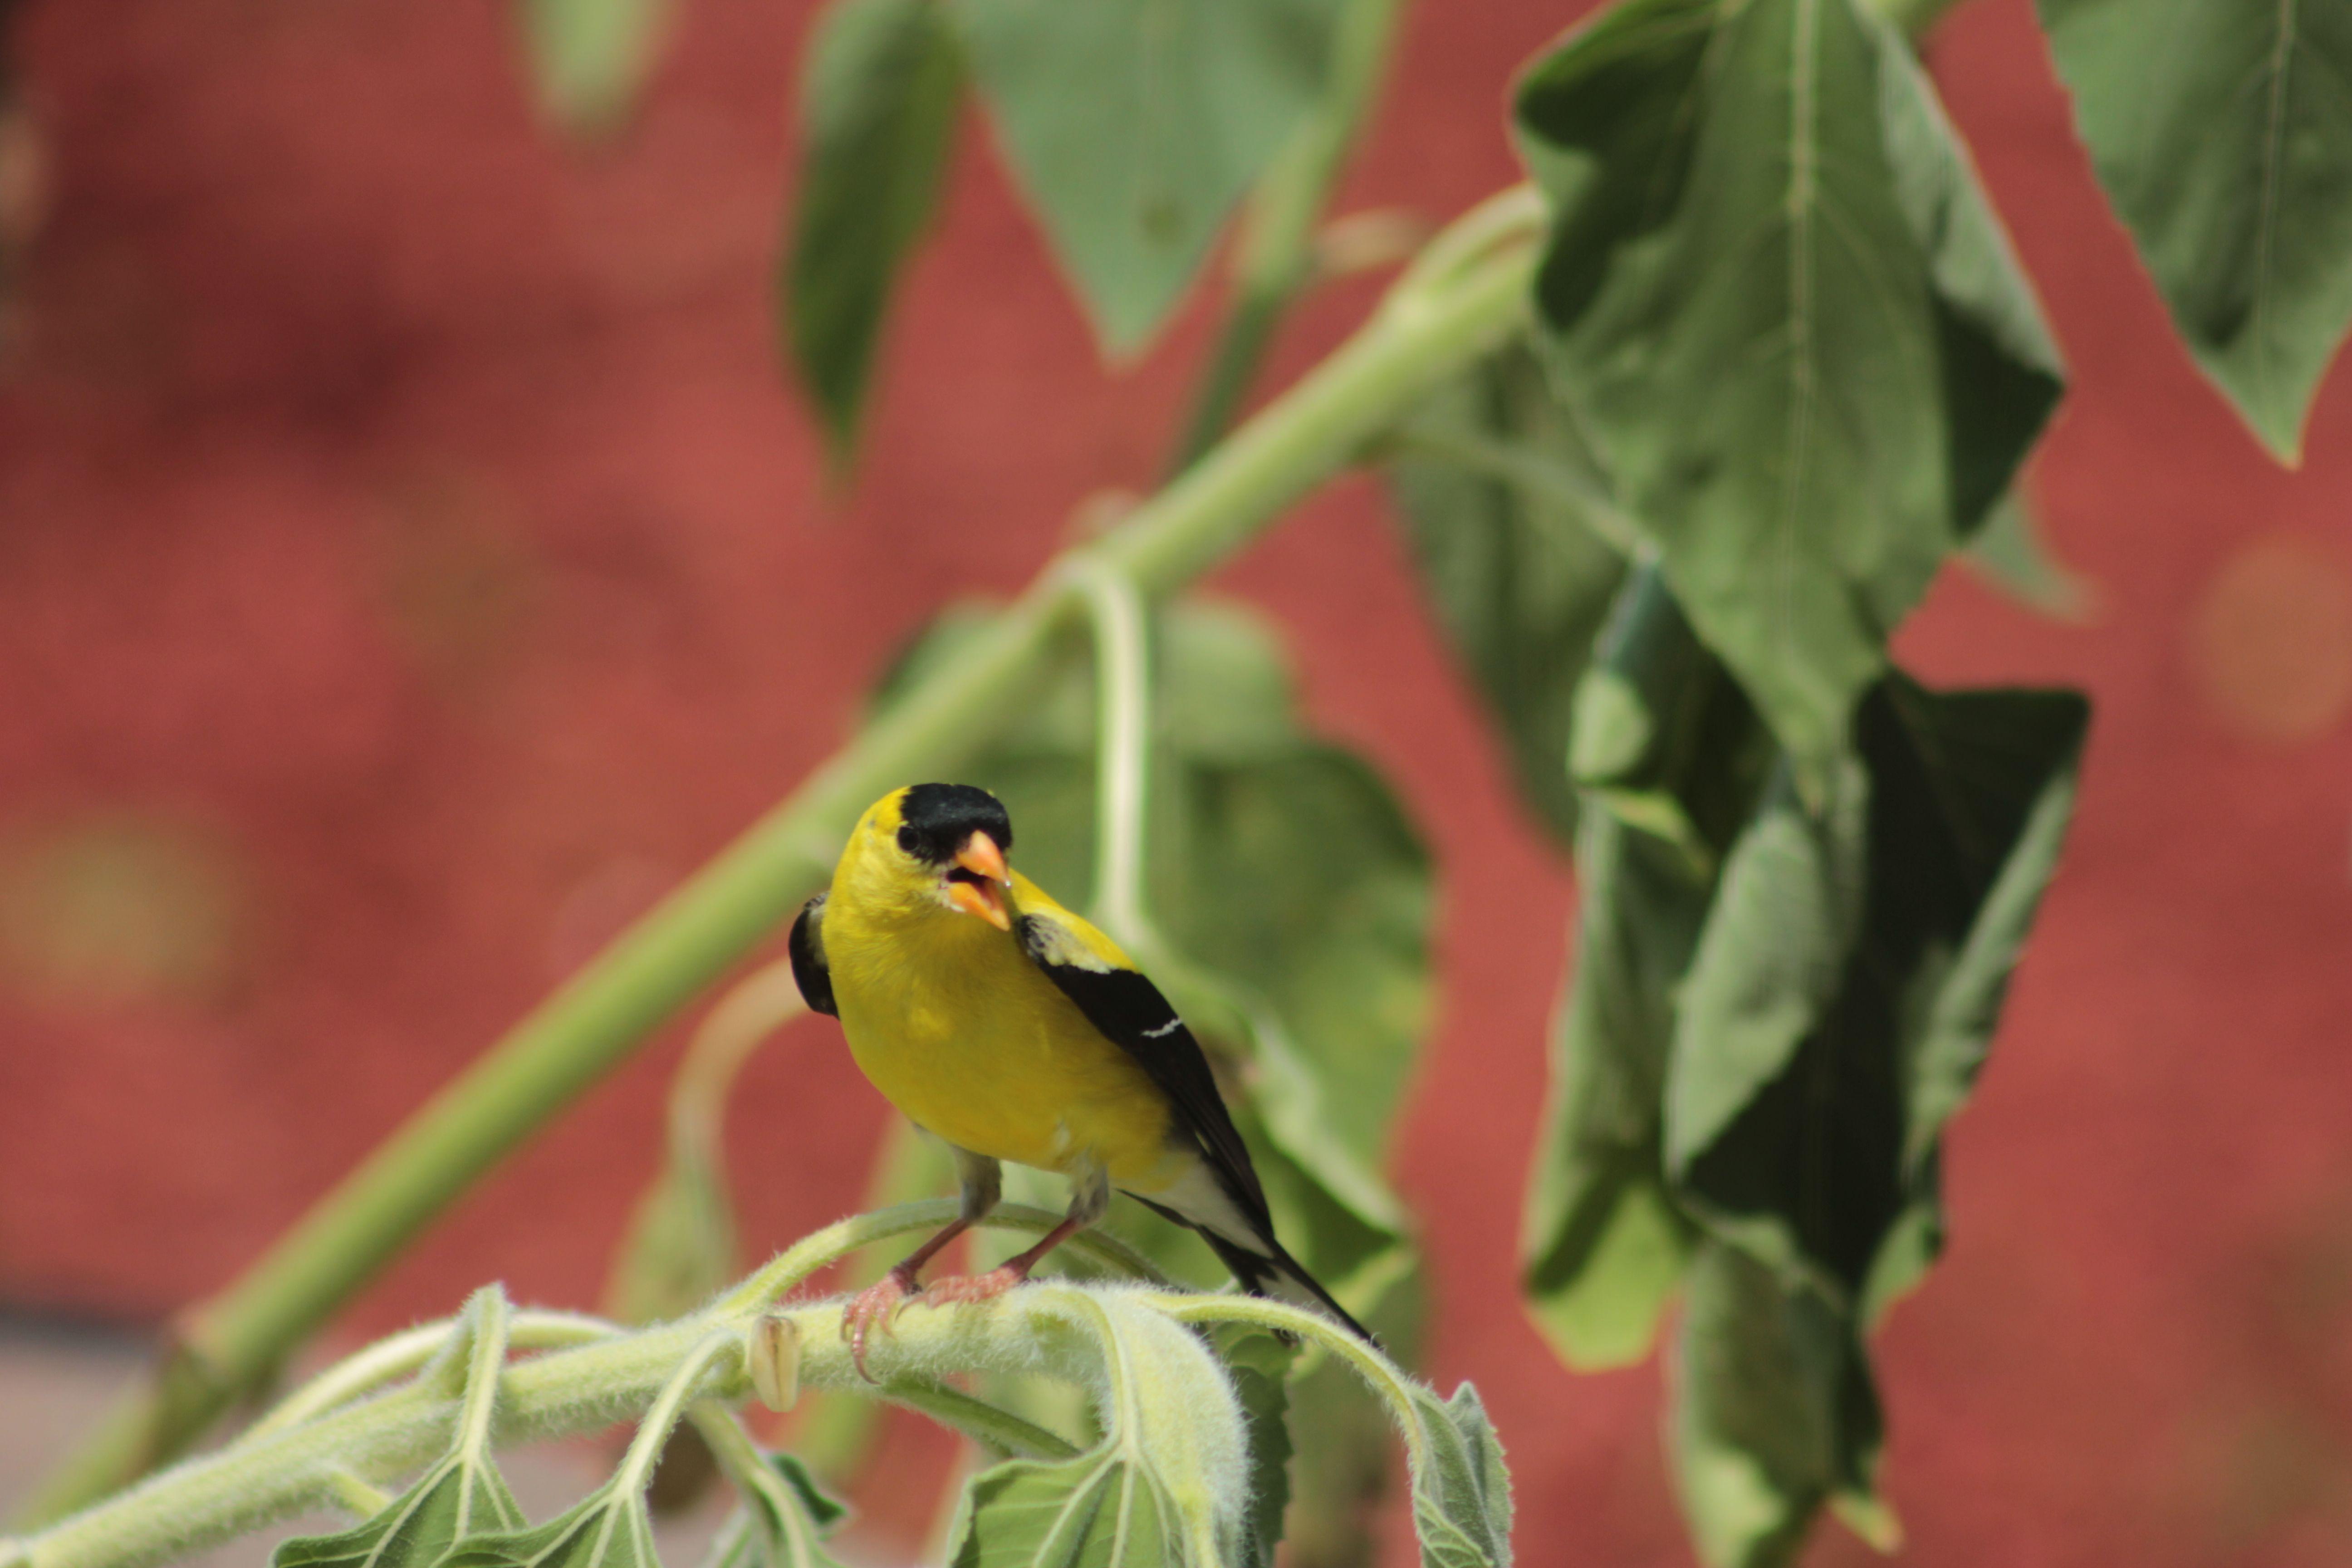 American Goldfinch feeding on my sunflowers